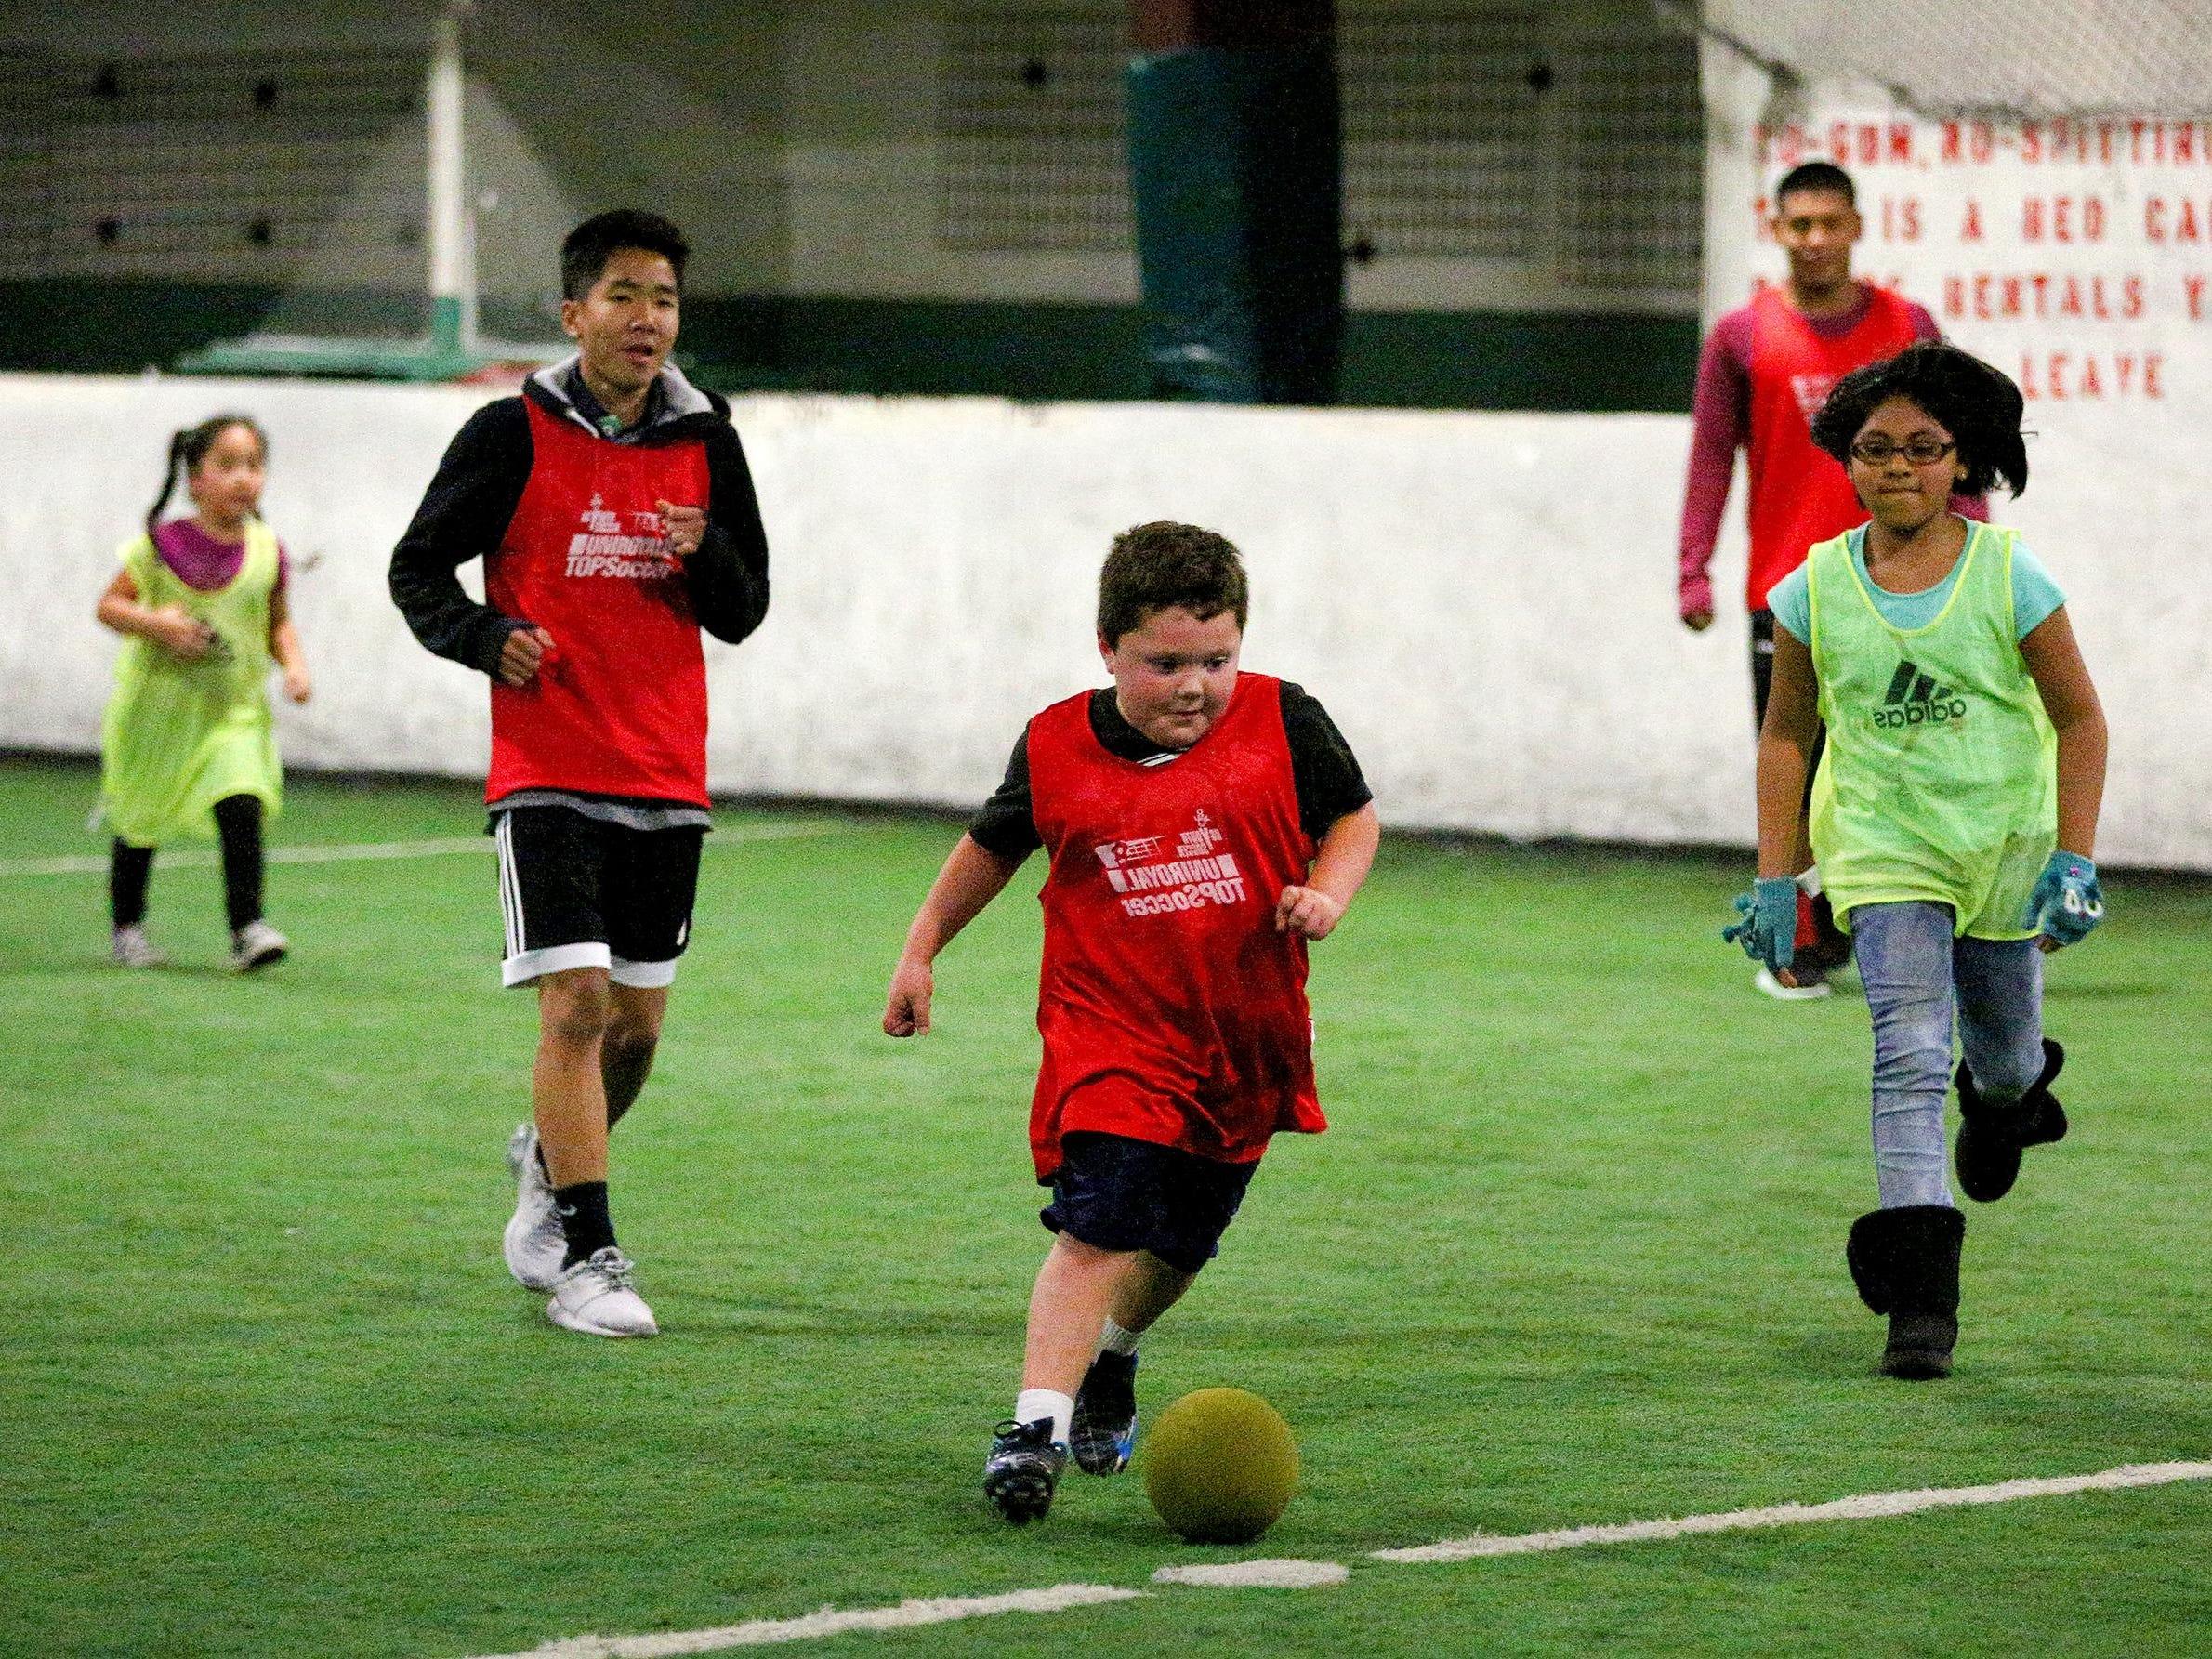 Jaiden Hernandez, 7, dribbles the ball during a youth soccer program with North Salem High School's boys soccer team, Wednesday, November 18, 2015, at Salem Indoor Soccer Center in Salem, Ore.